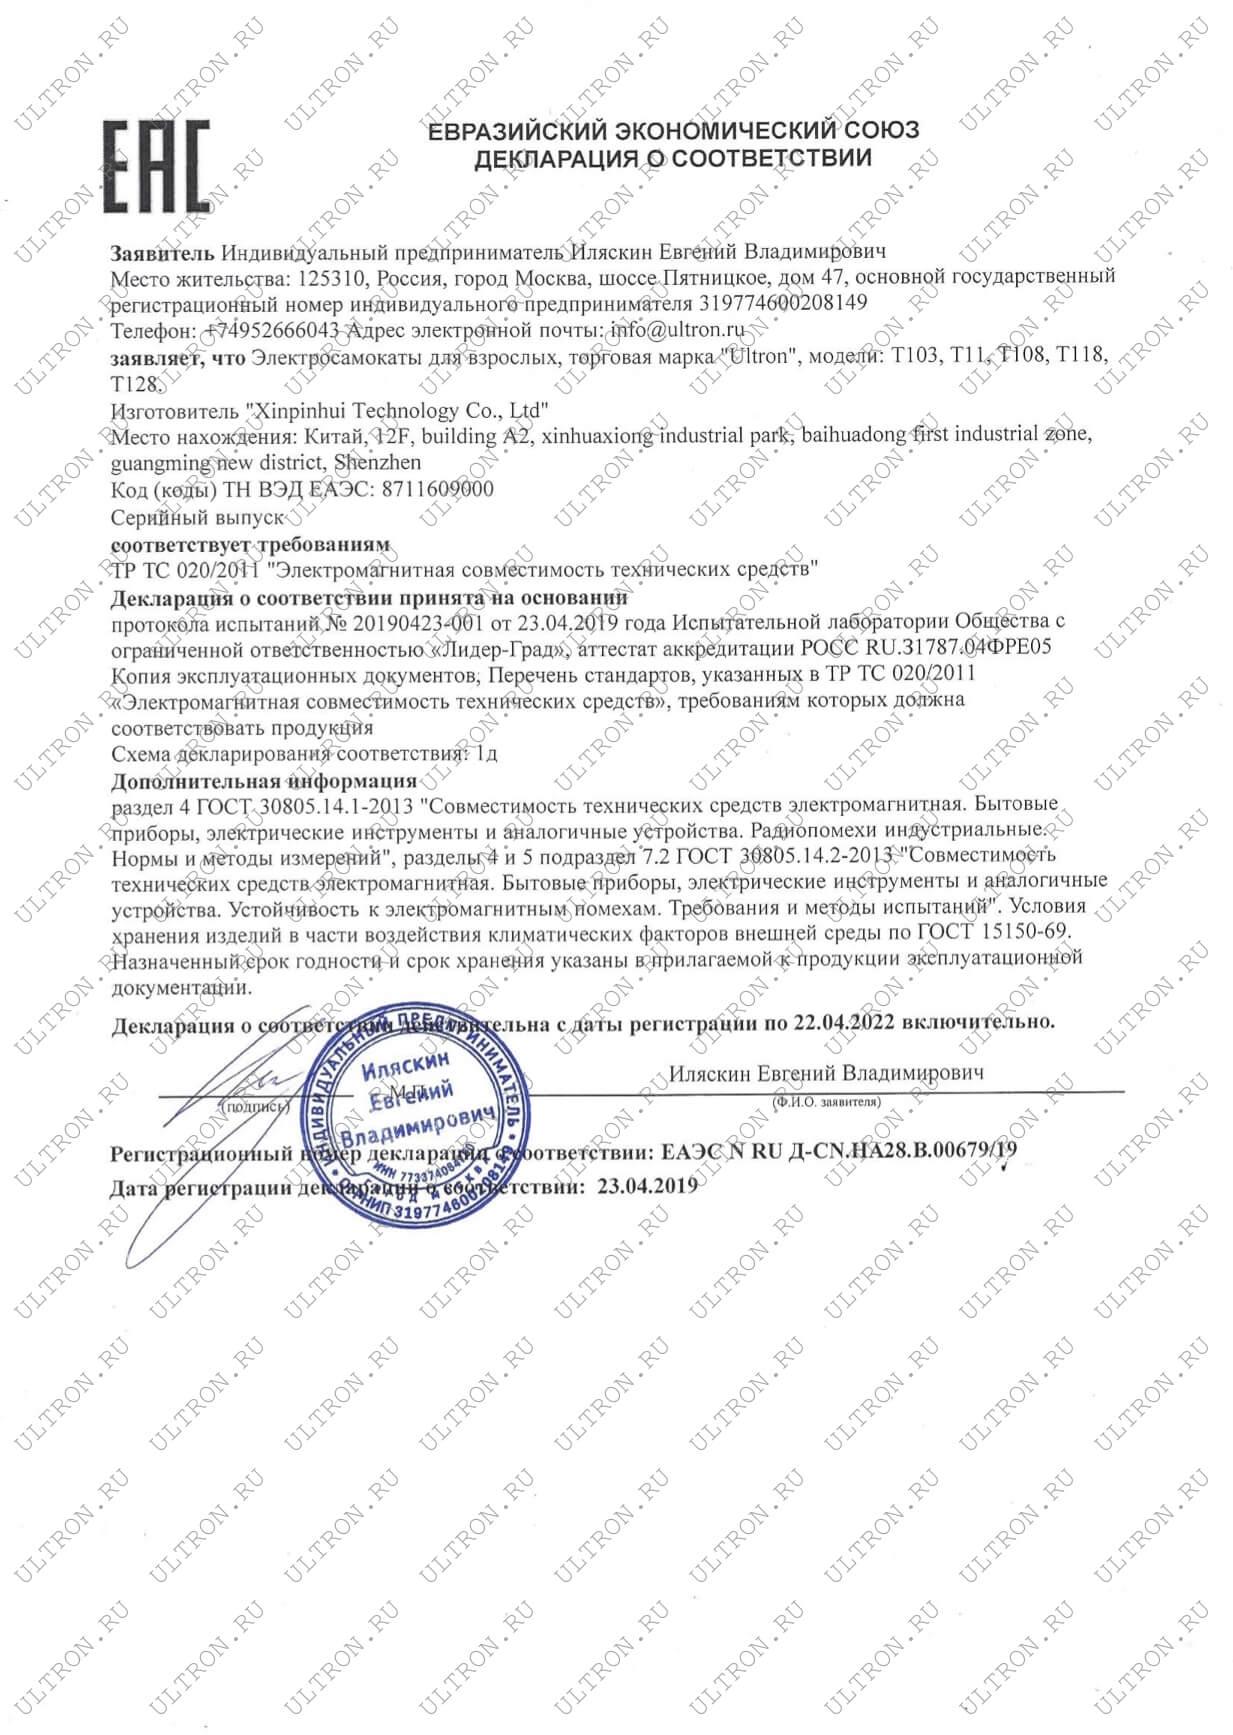 ULTRON.RU Сертификат EAC